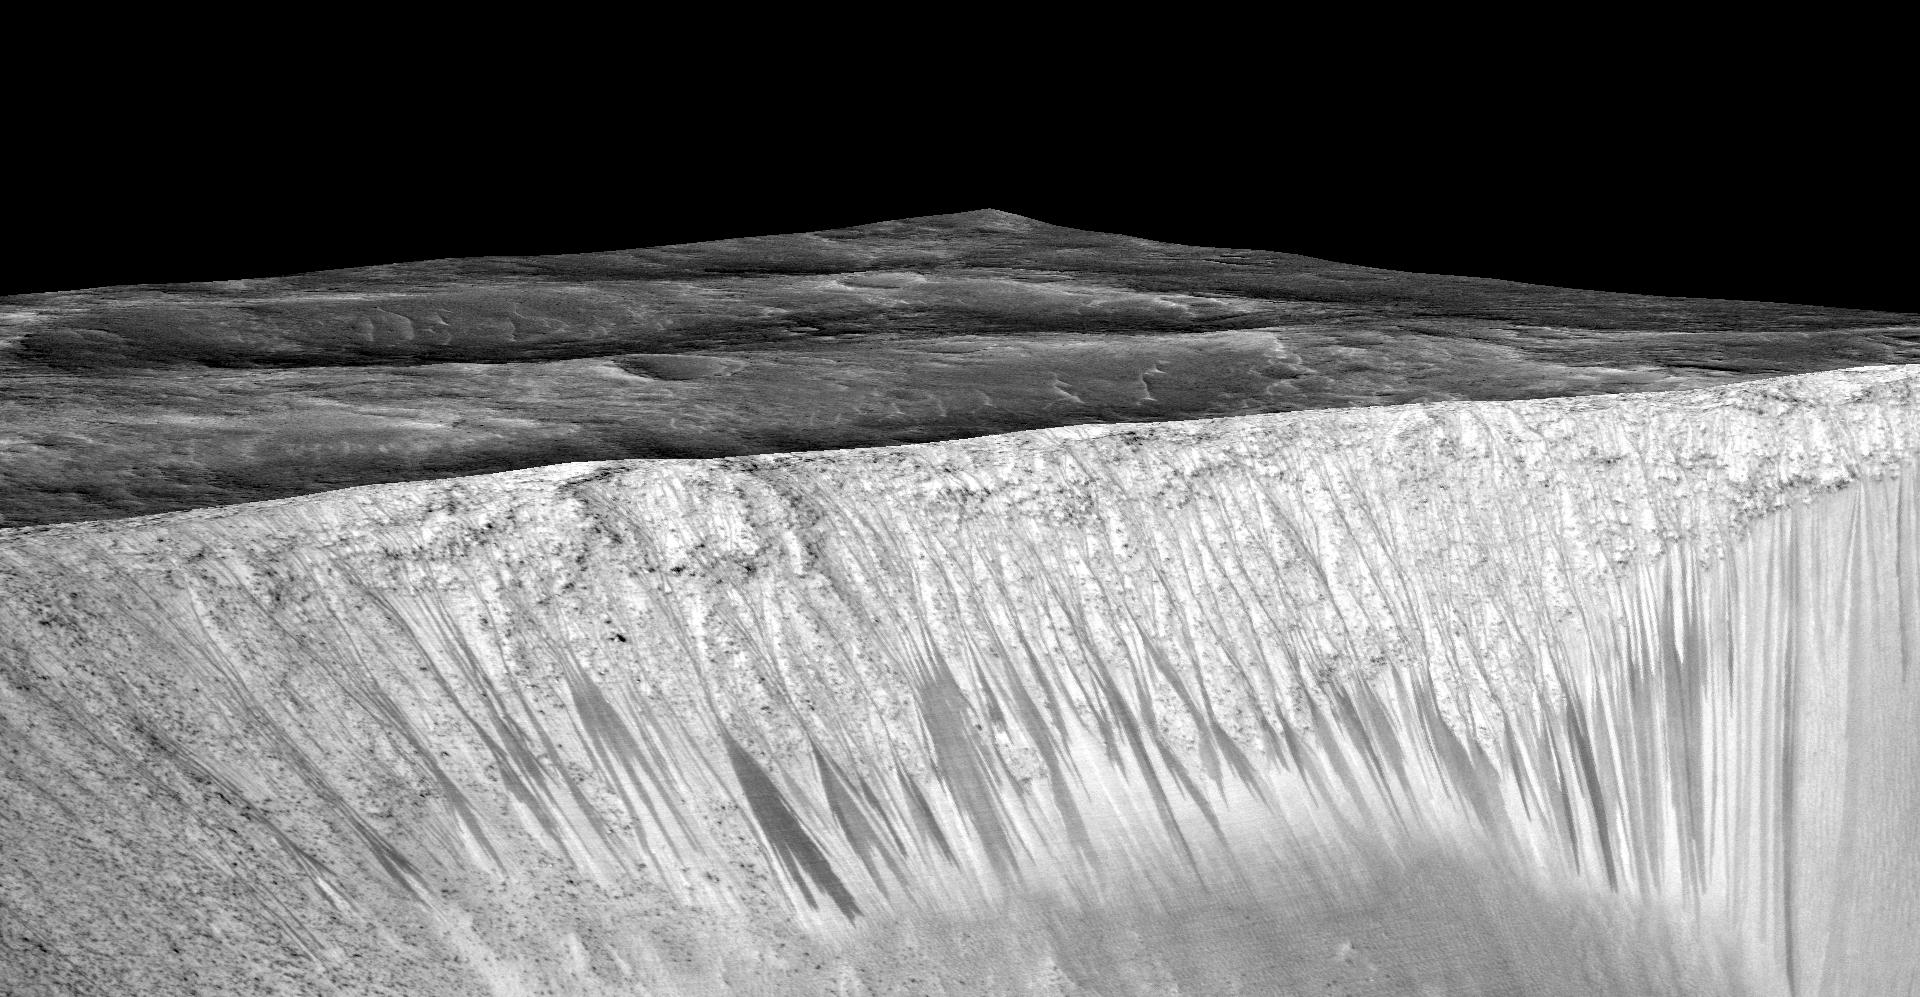 Water on Mars 2